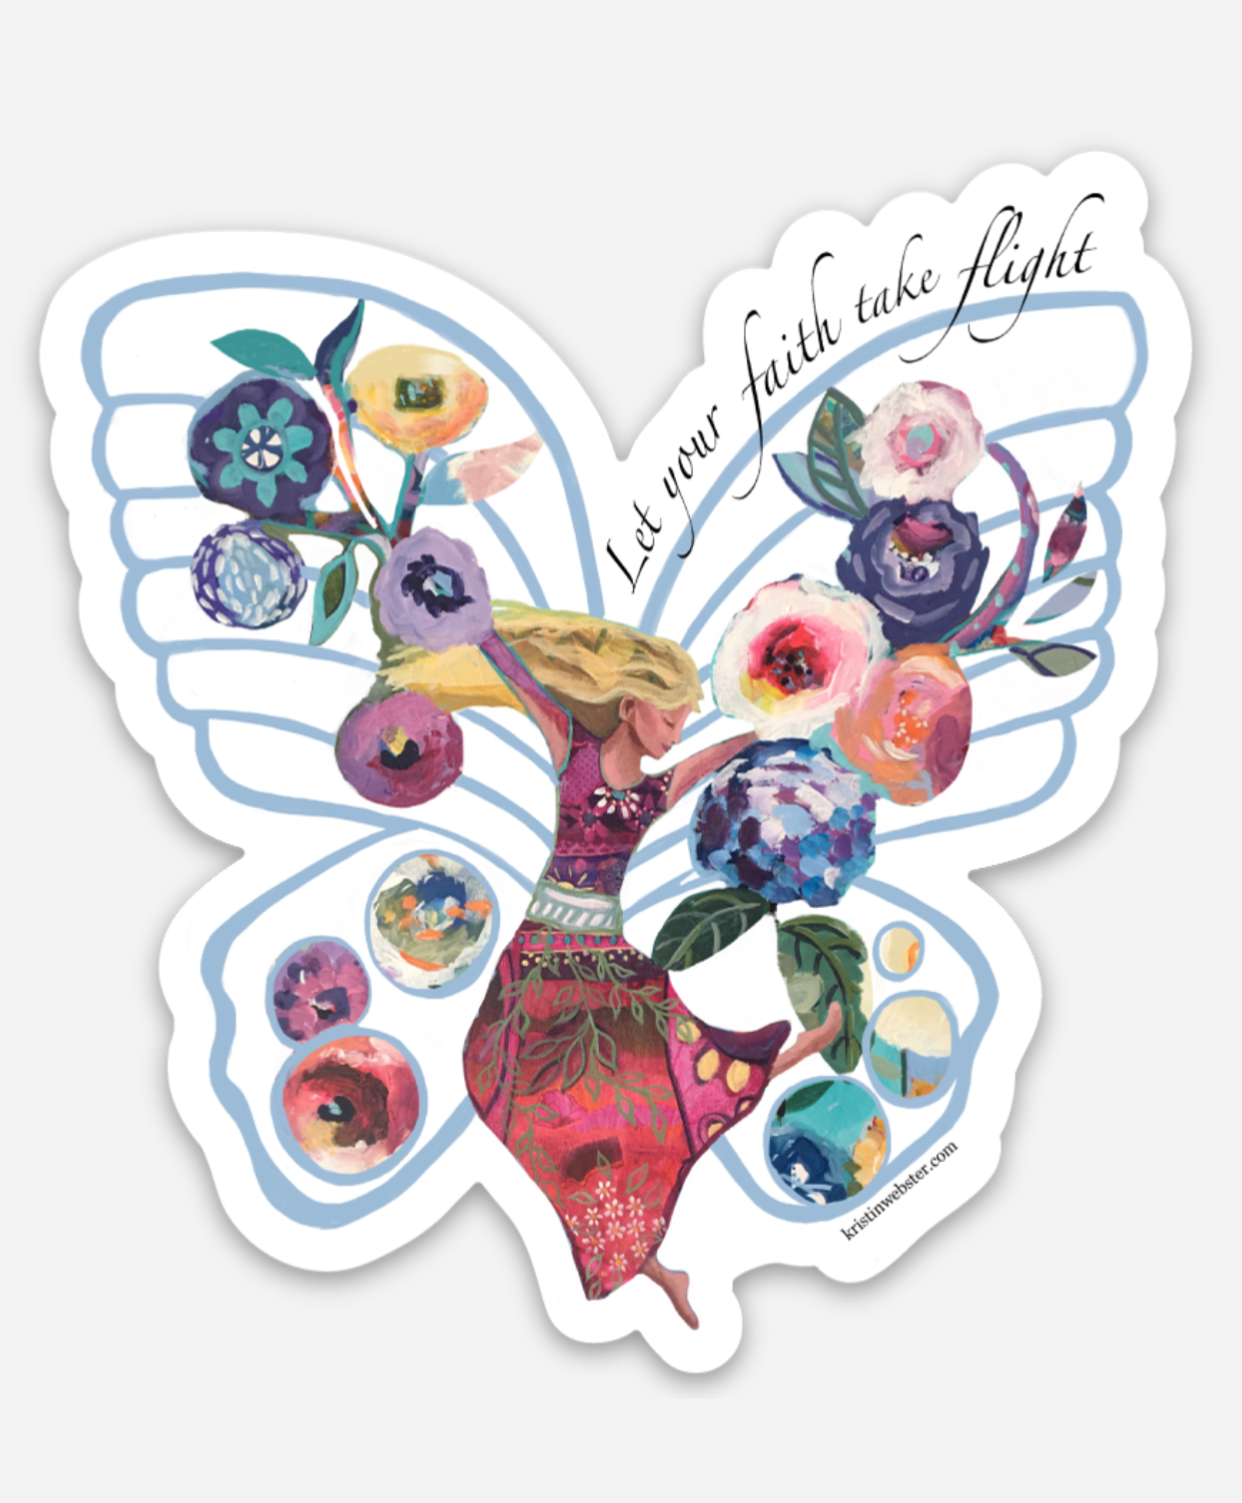 Let your faith take flight sticker y6bmfe